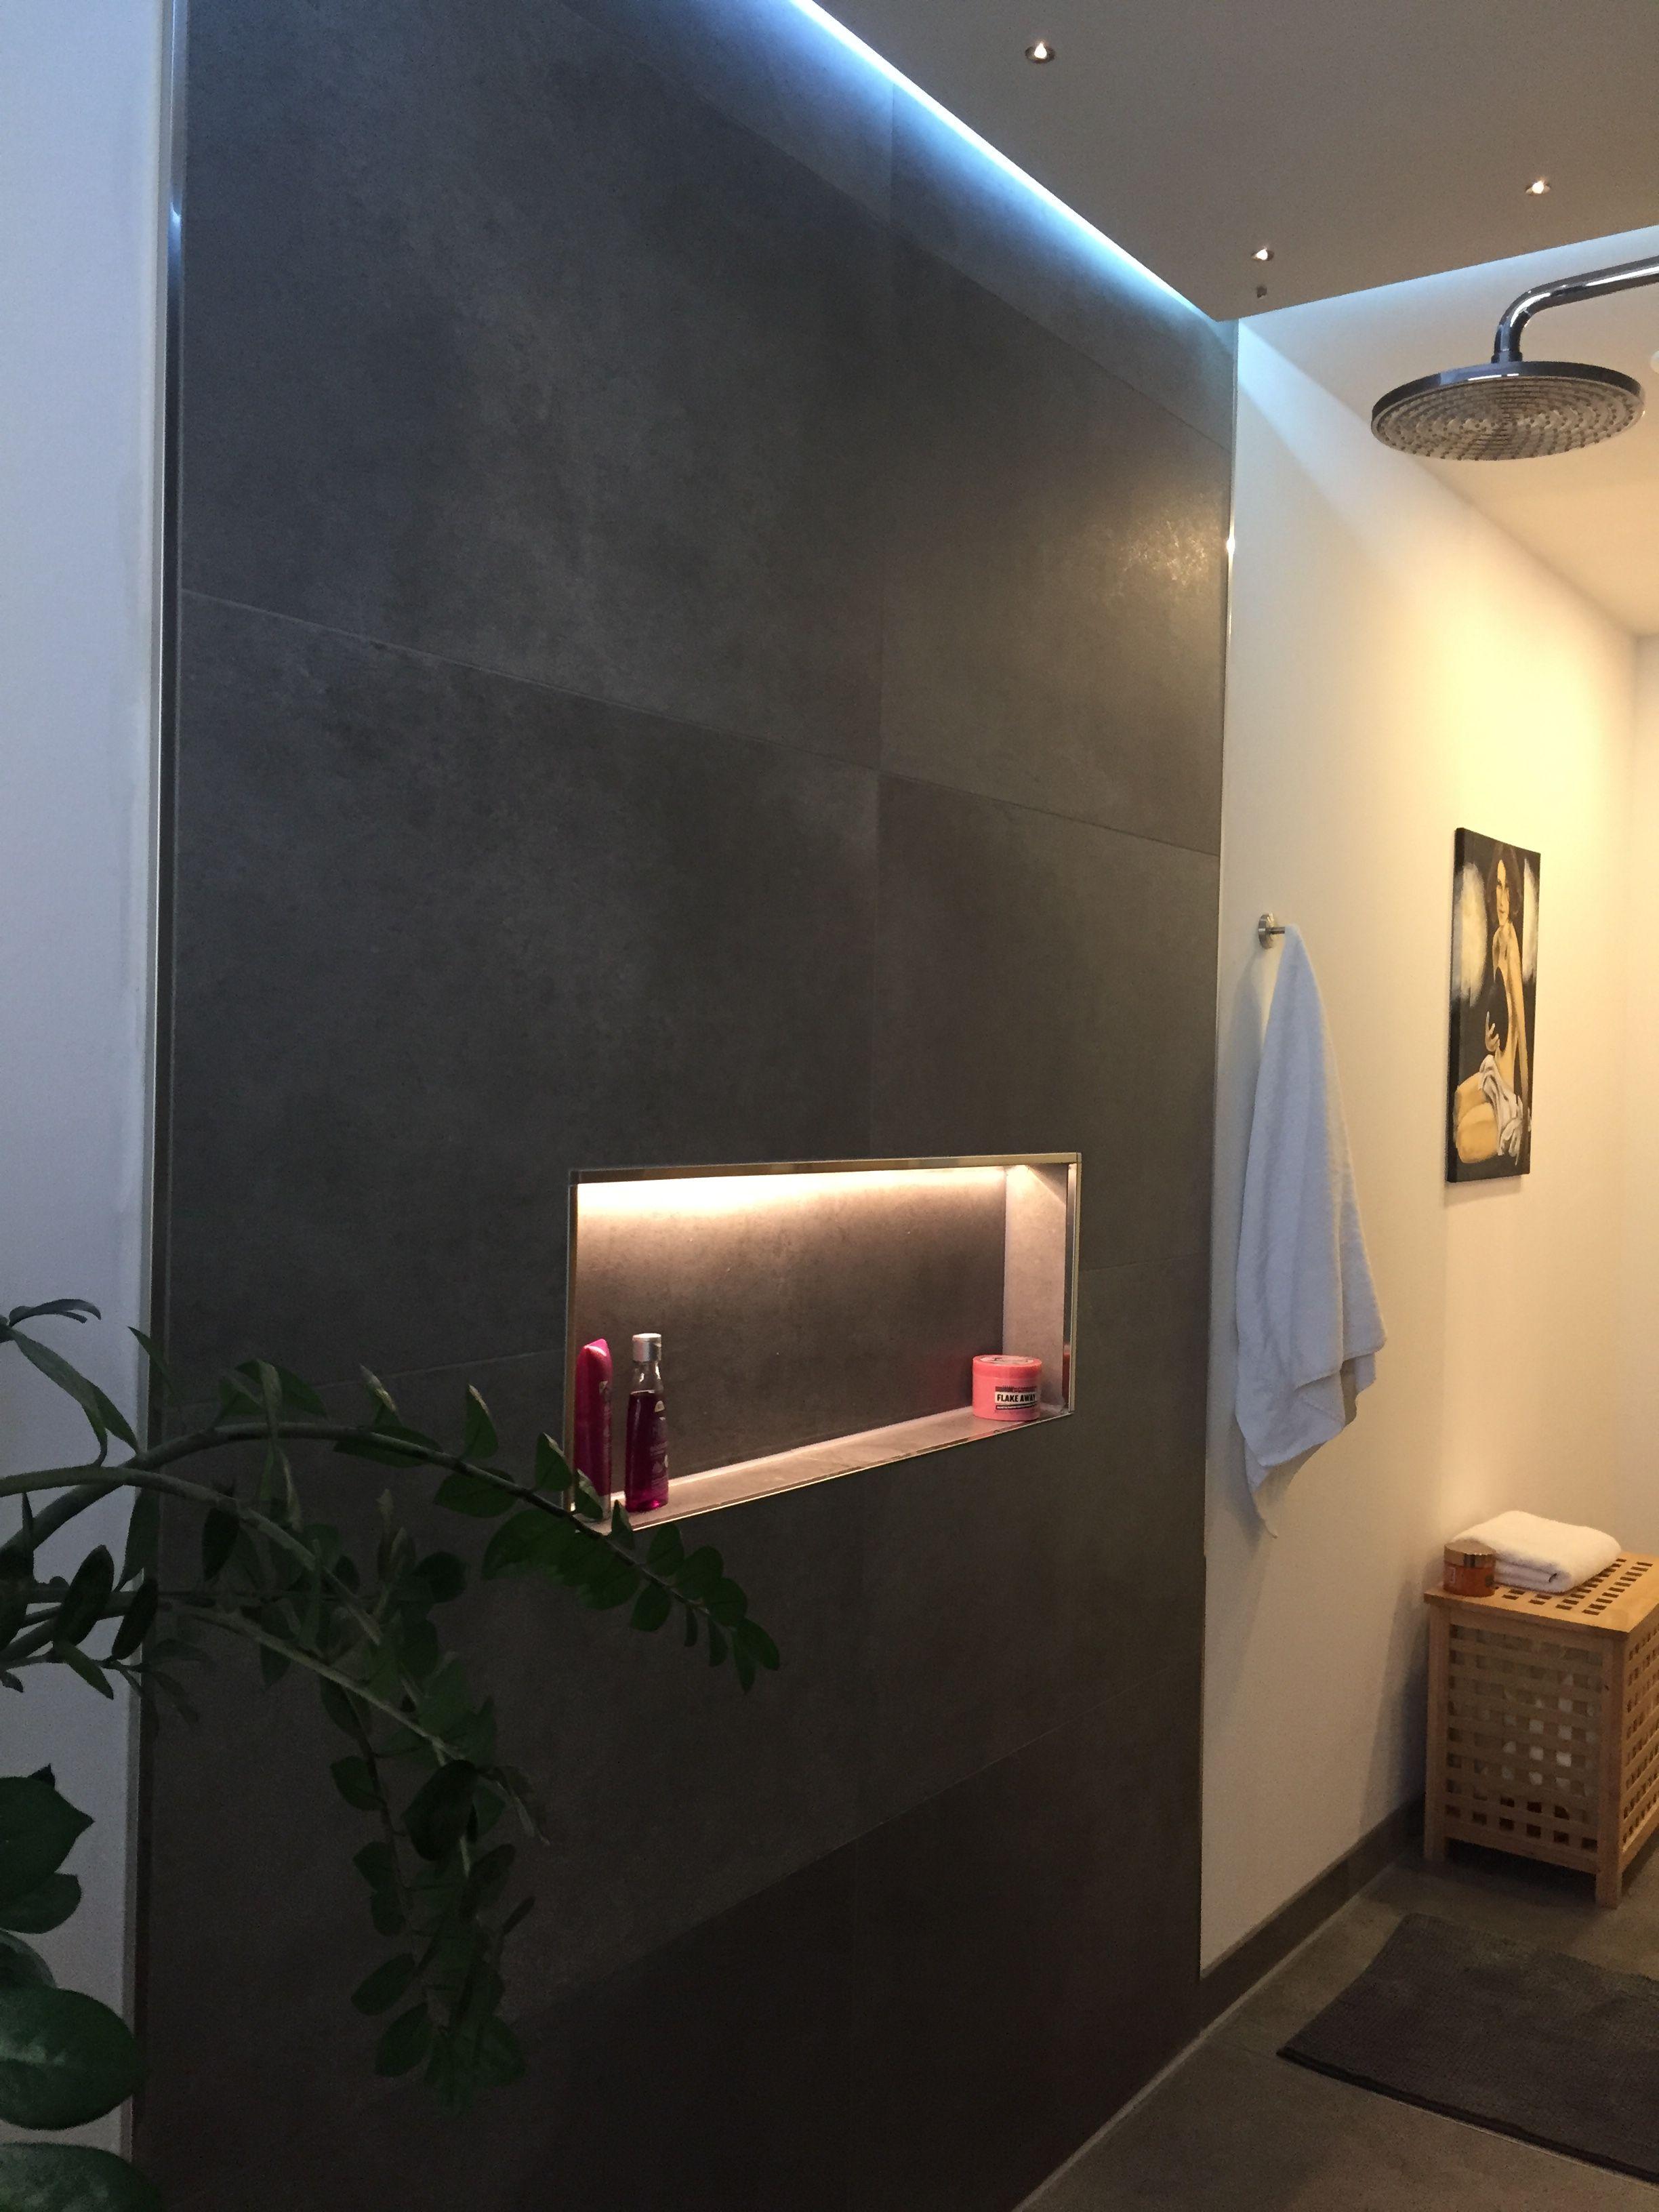 Bathroom Shower Light Indirect Indirekte Beleuchtung Abkastung Led Badezimmer Dusche Beleuchtung Badezimmer Licht Indirekte Beleuchtung